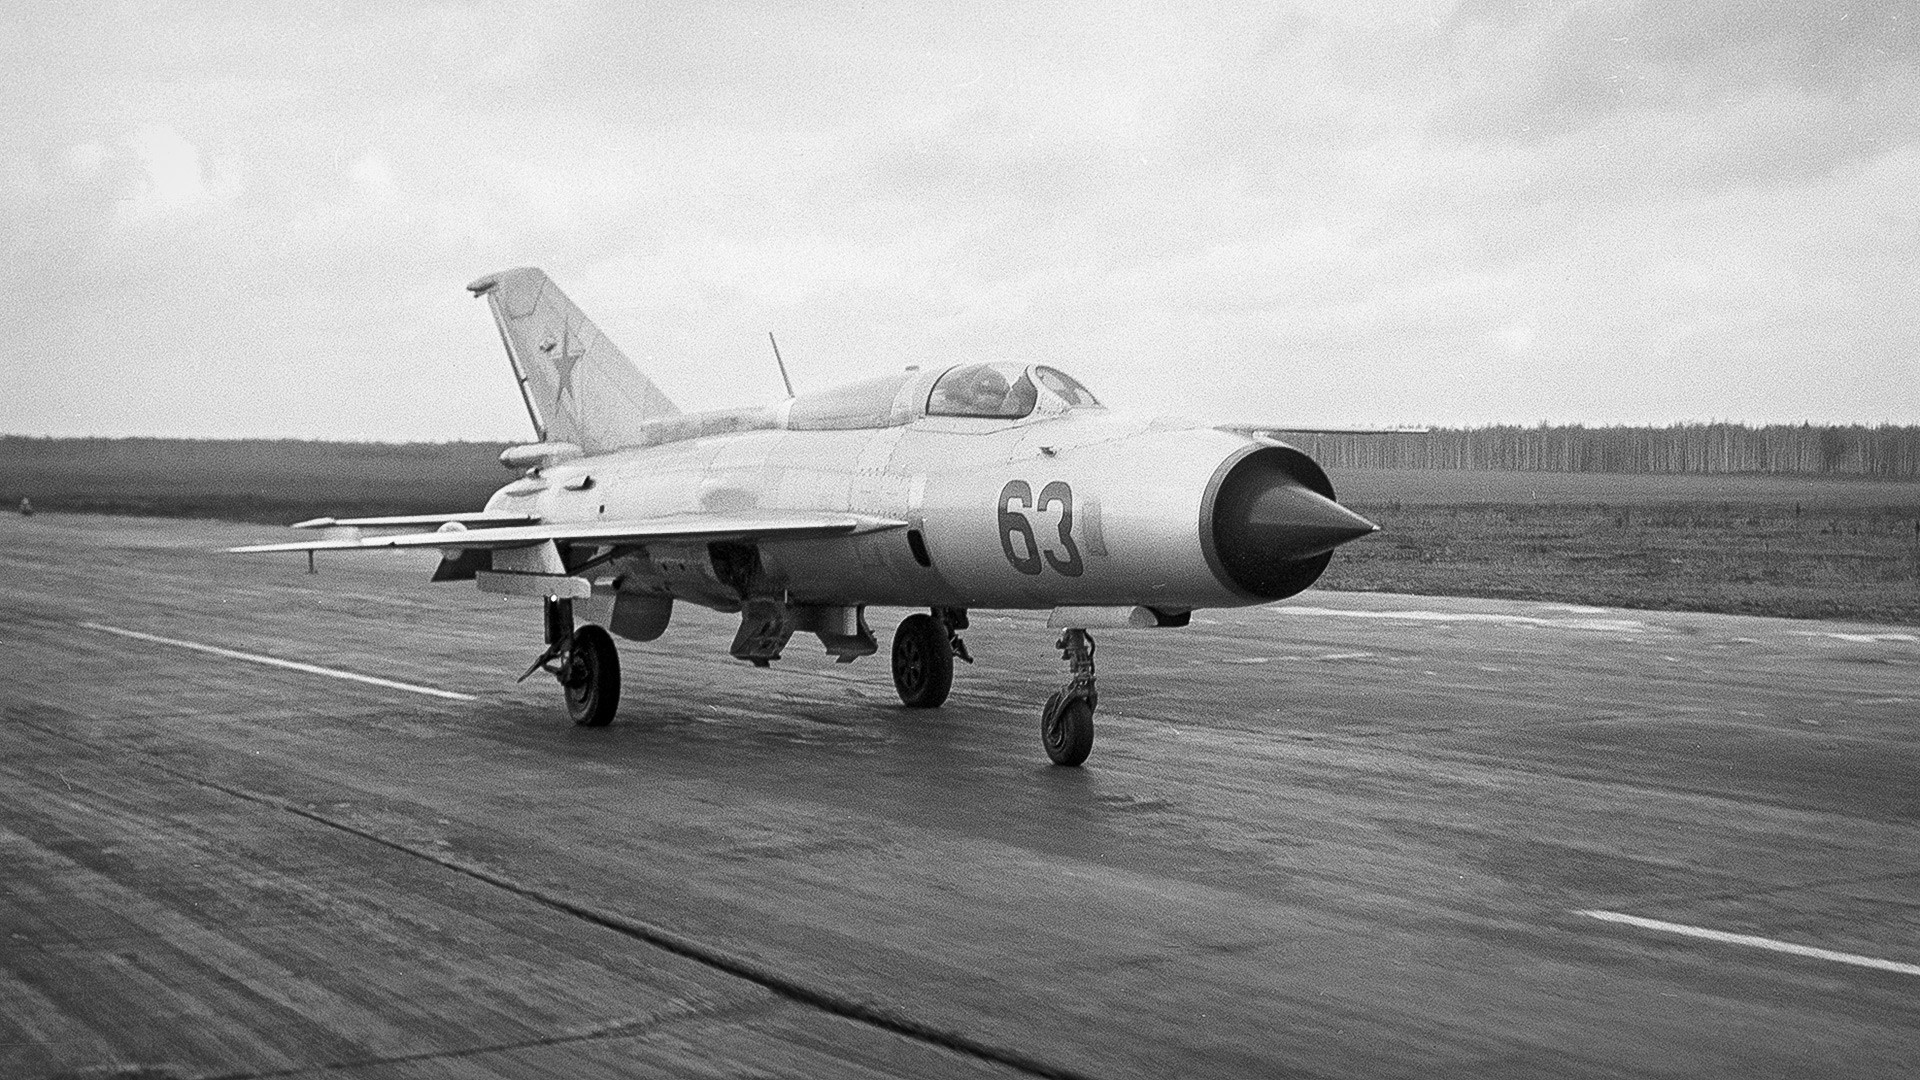 Pada awal 1960-an, pesawat itu mencetak rekor dengan mencapai kecepatan 2.386 km/jam.